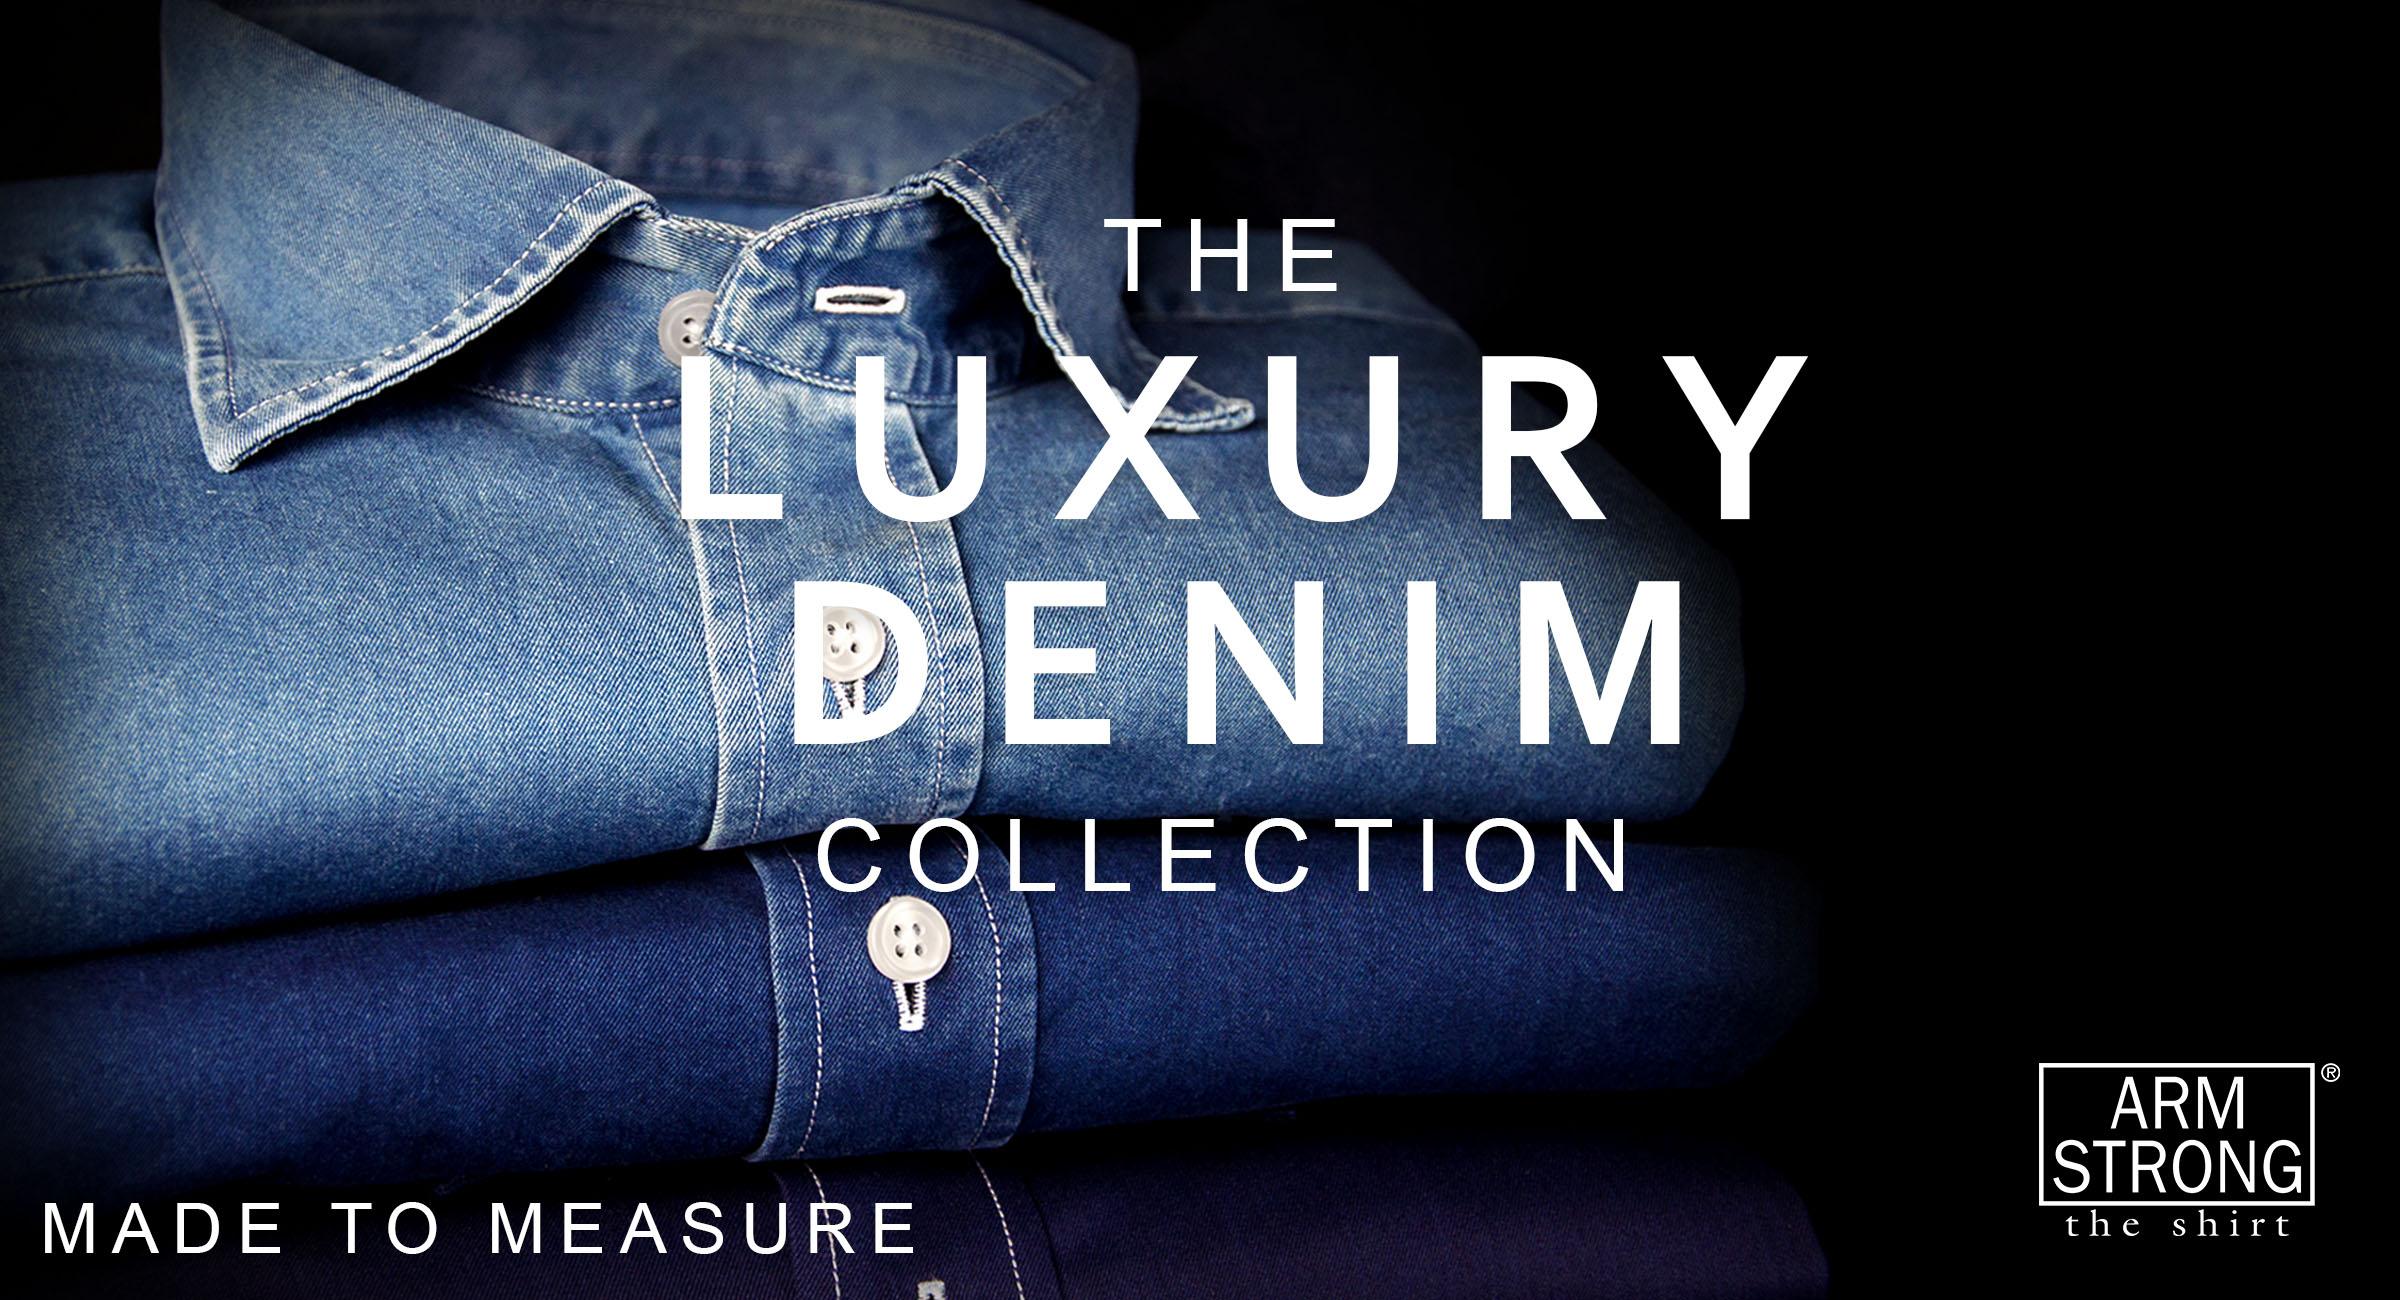 Denim Collection